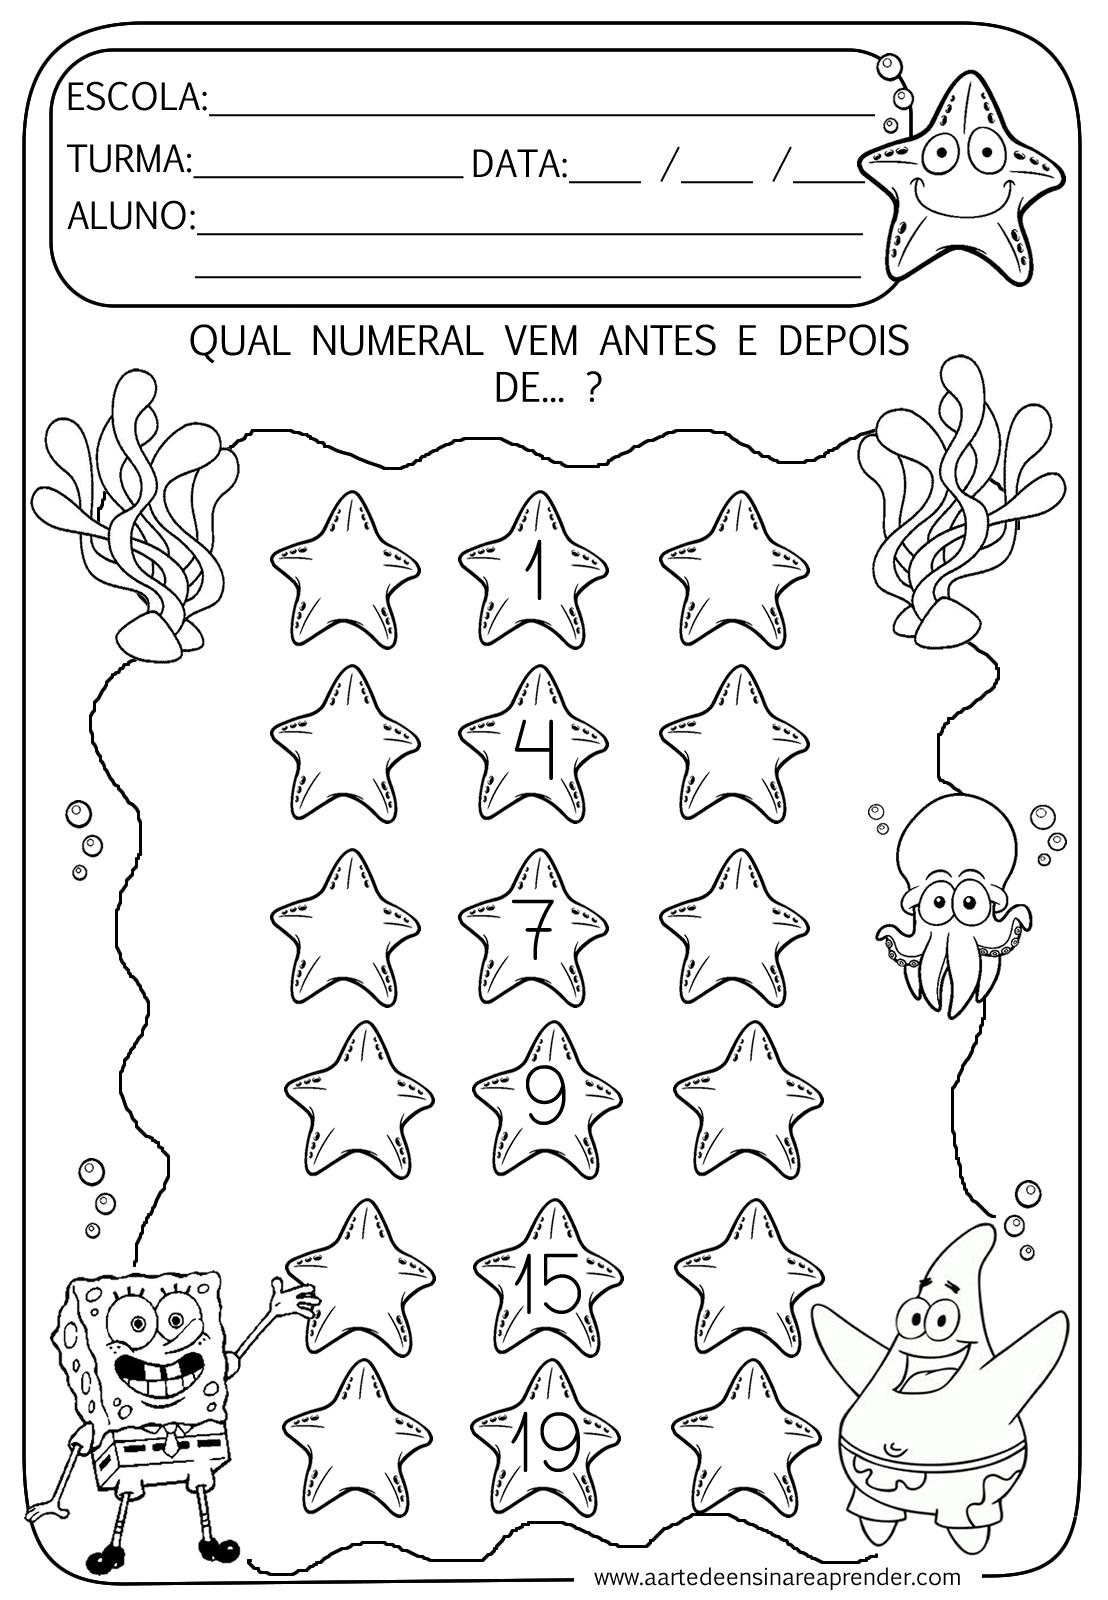 Mariana anacleto anacletomari on pinterest